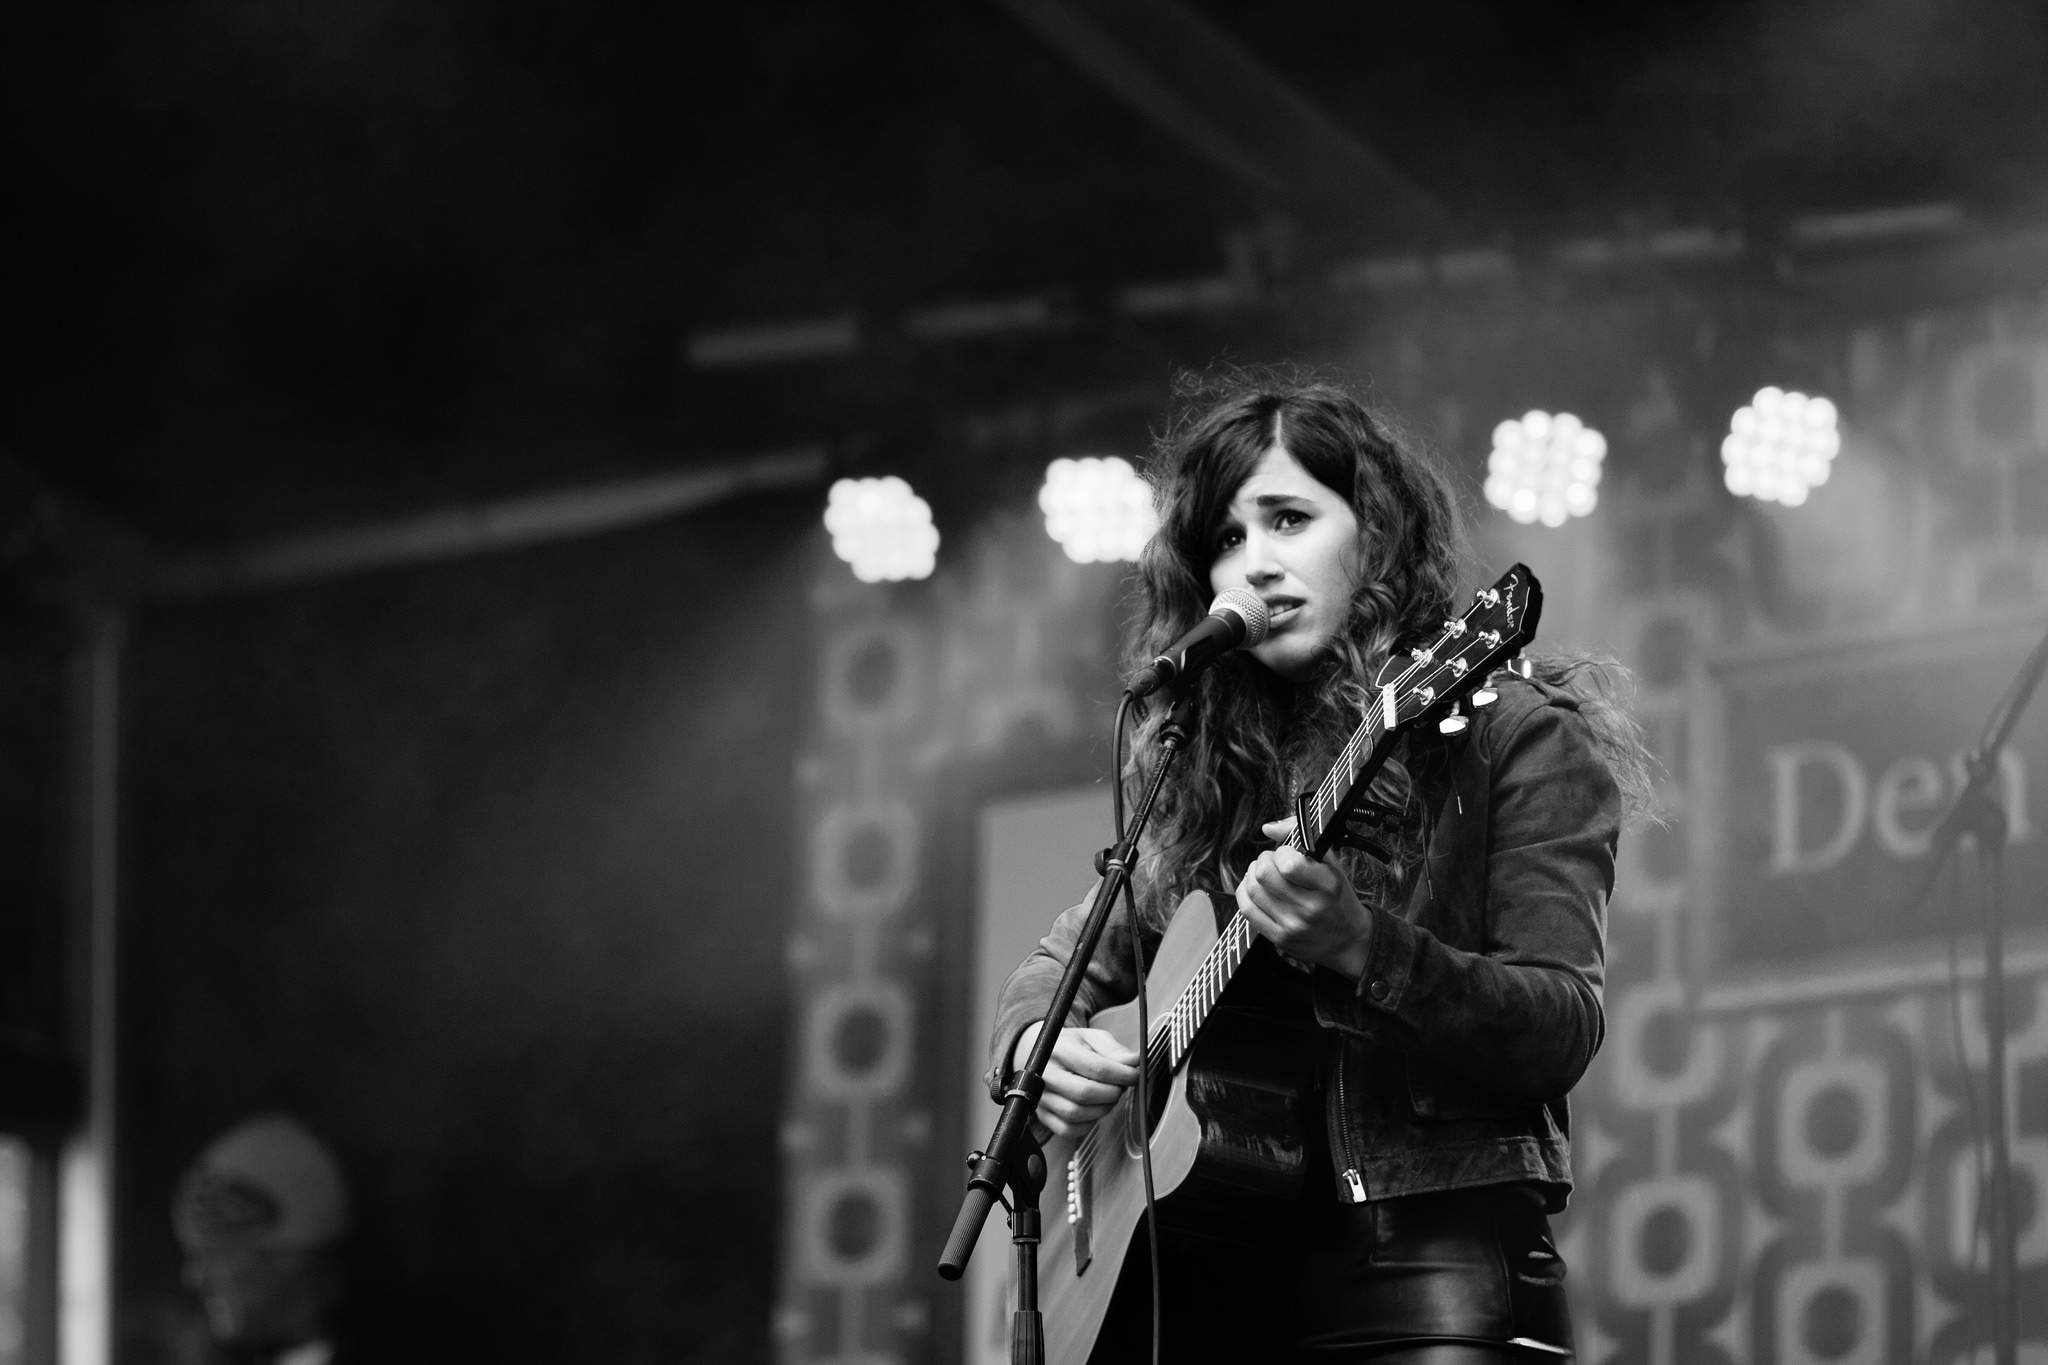 luminize6 Luminize at The Life I Live Festival in Den Haag 2016